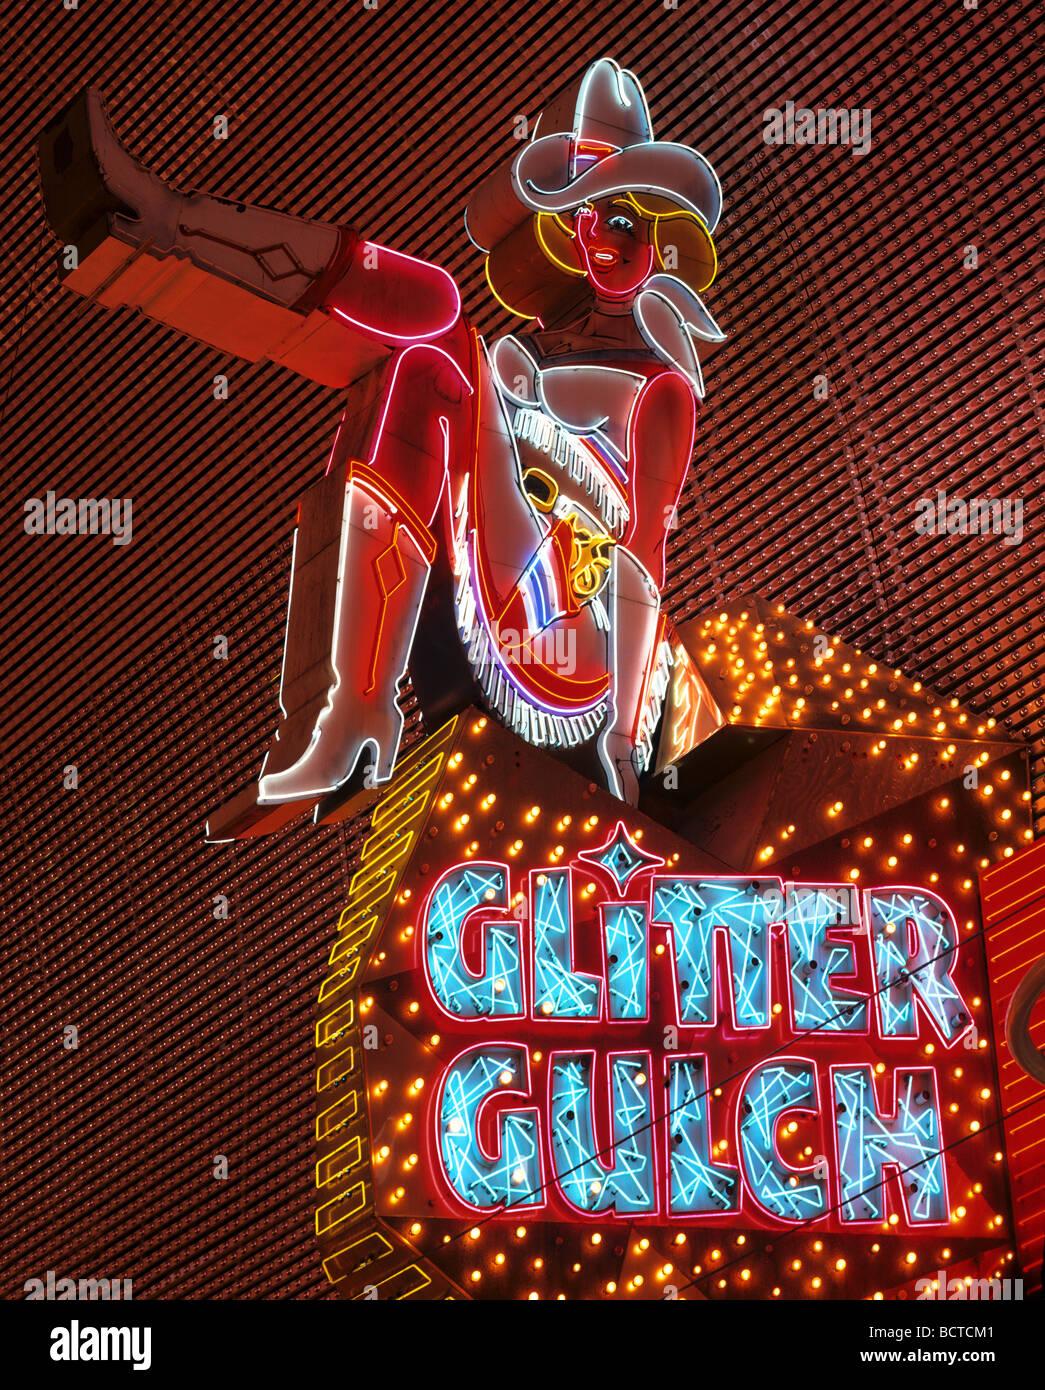 Vicky, Neon Werbung, Glitter Gulch, Cowboy, Las Vegas, Nevada, USA Stockbild